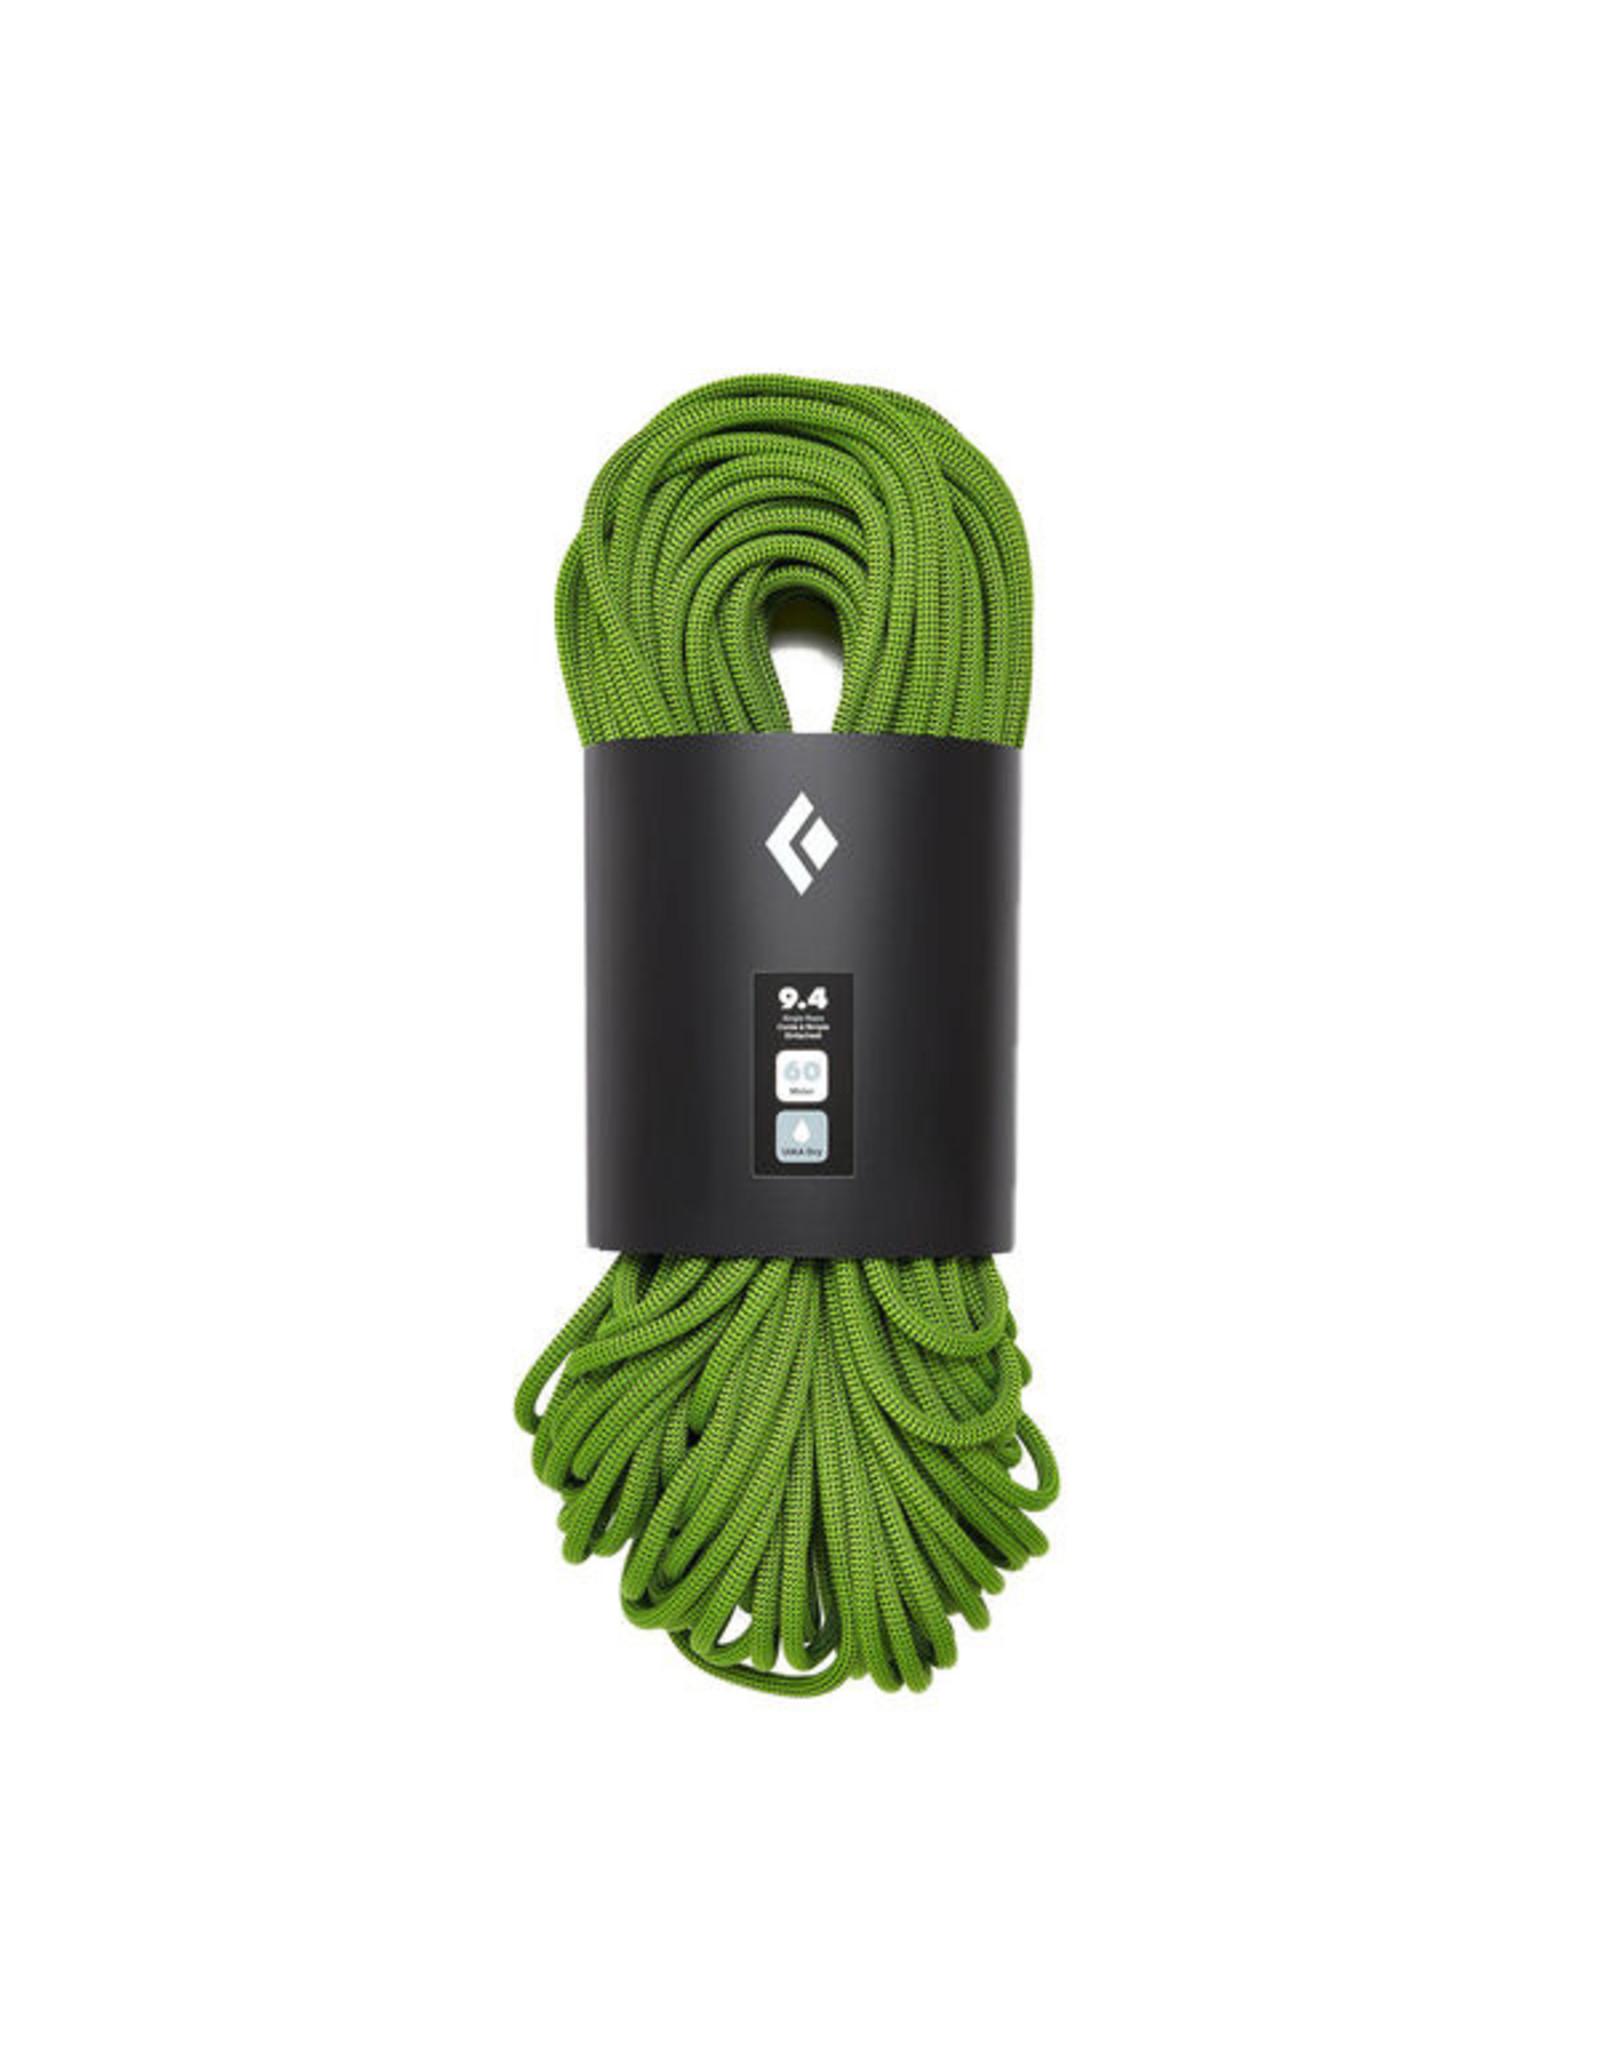 Black Diamond 9.4 Dynamic Rope - 60m - DRY